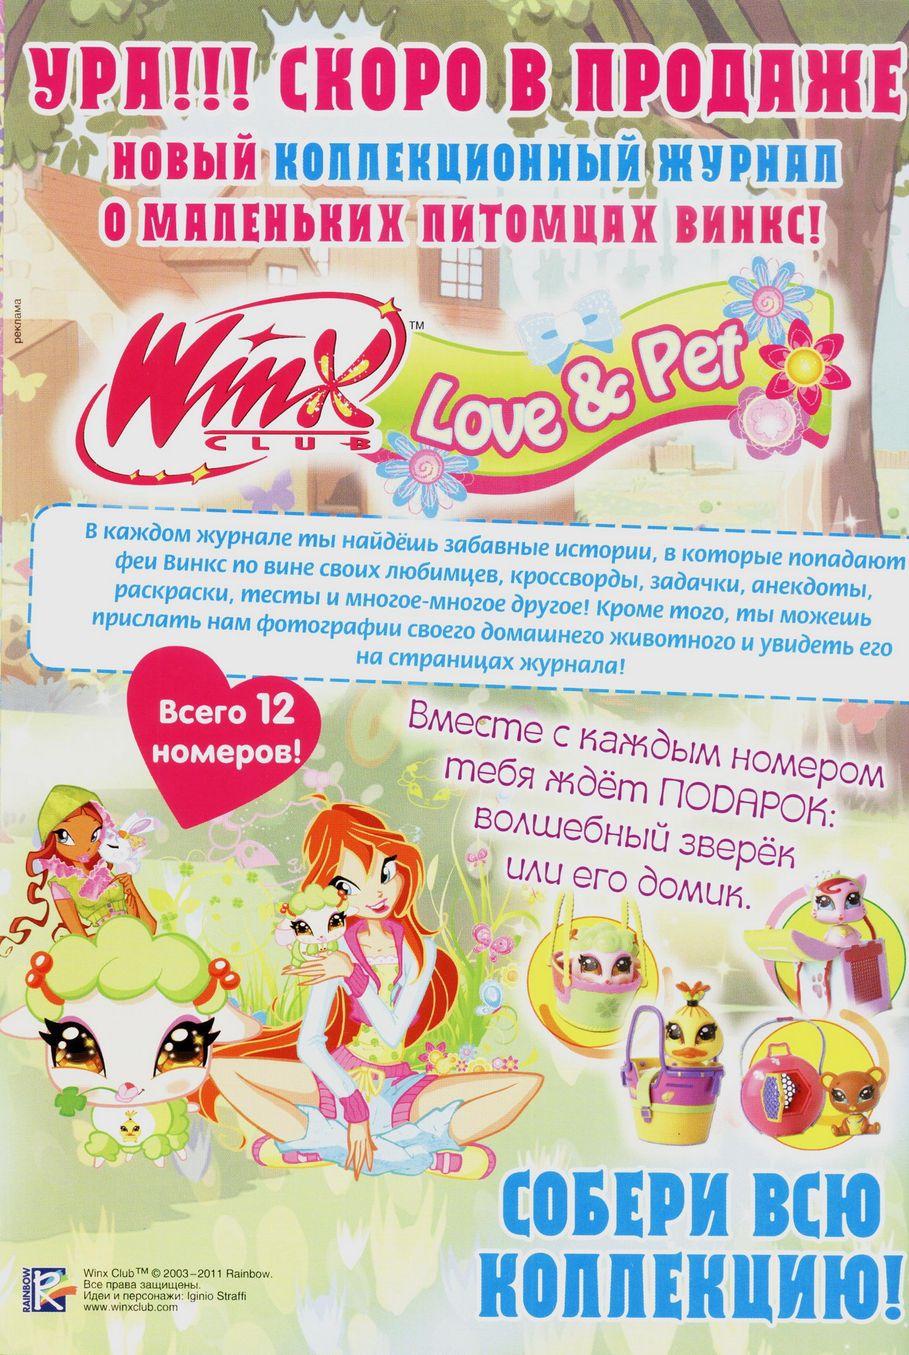 Комикс Винкс Winx - Волшебник Камуд (Журнал Винкс №6 2011) - стр. 68